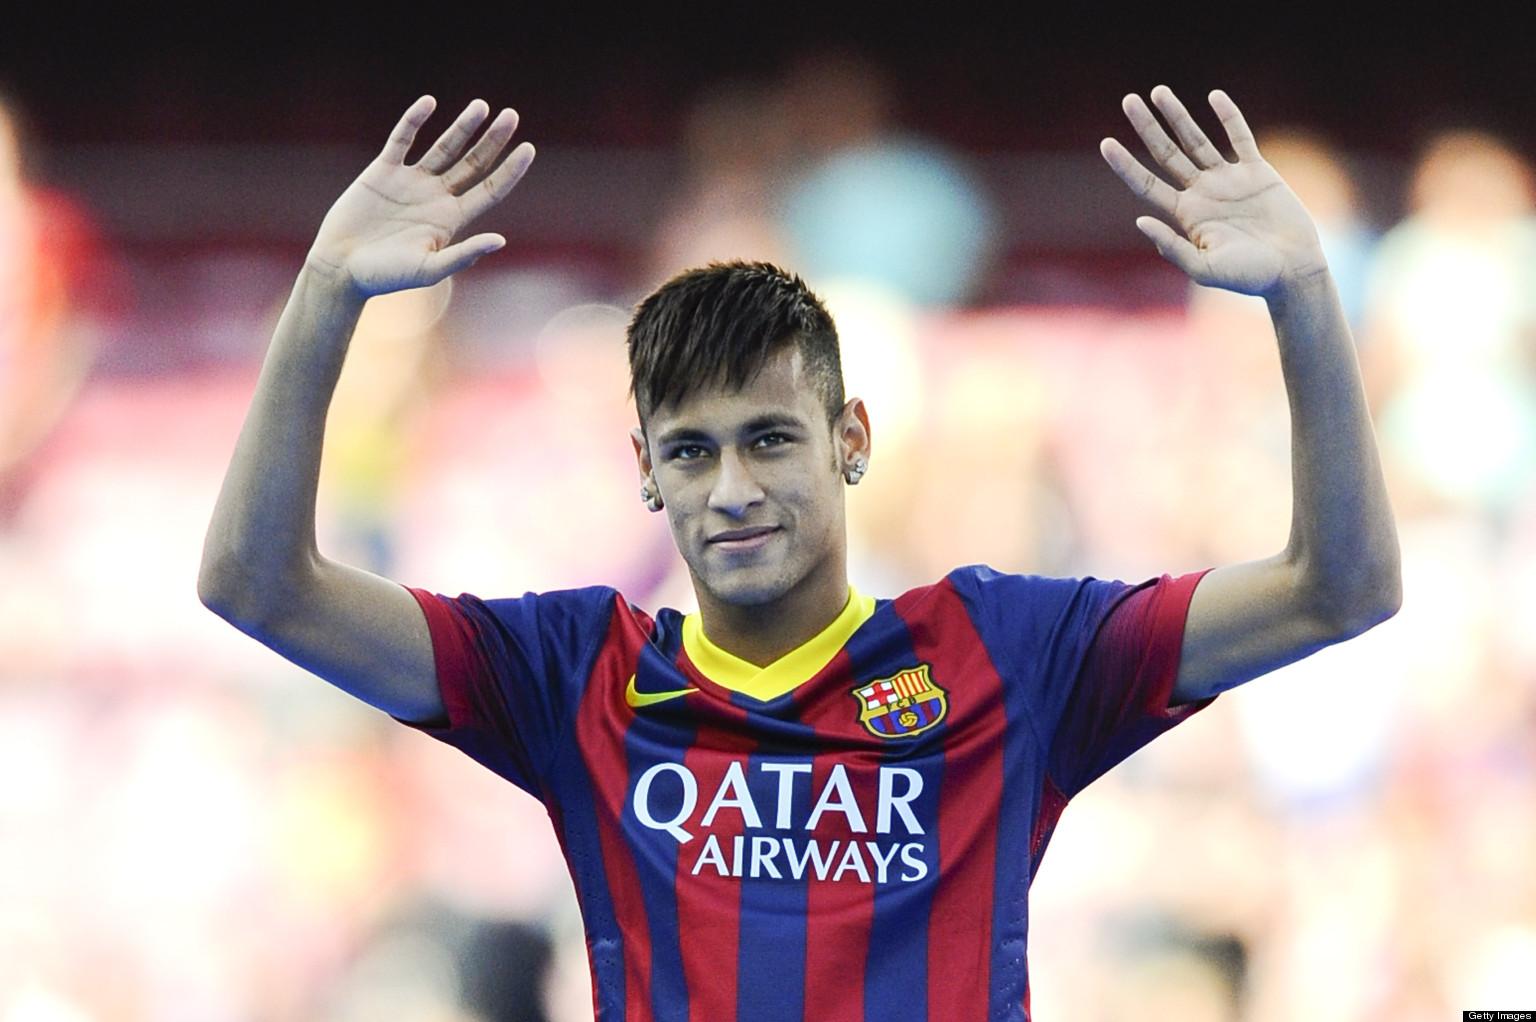 Neymar Barcelona 2013Neymar 2014 Hairstyle